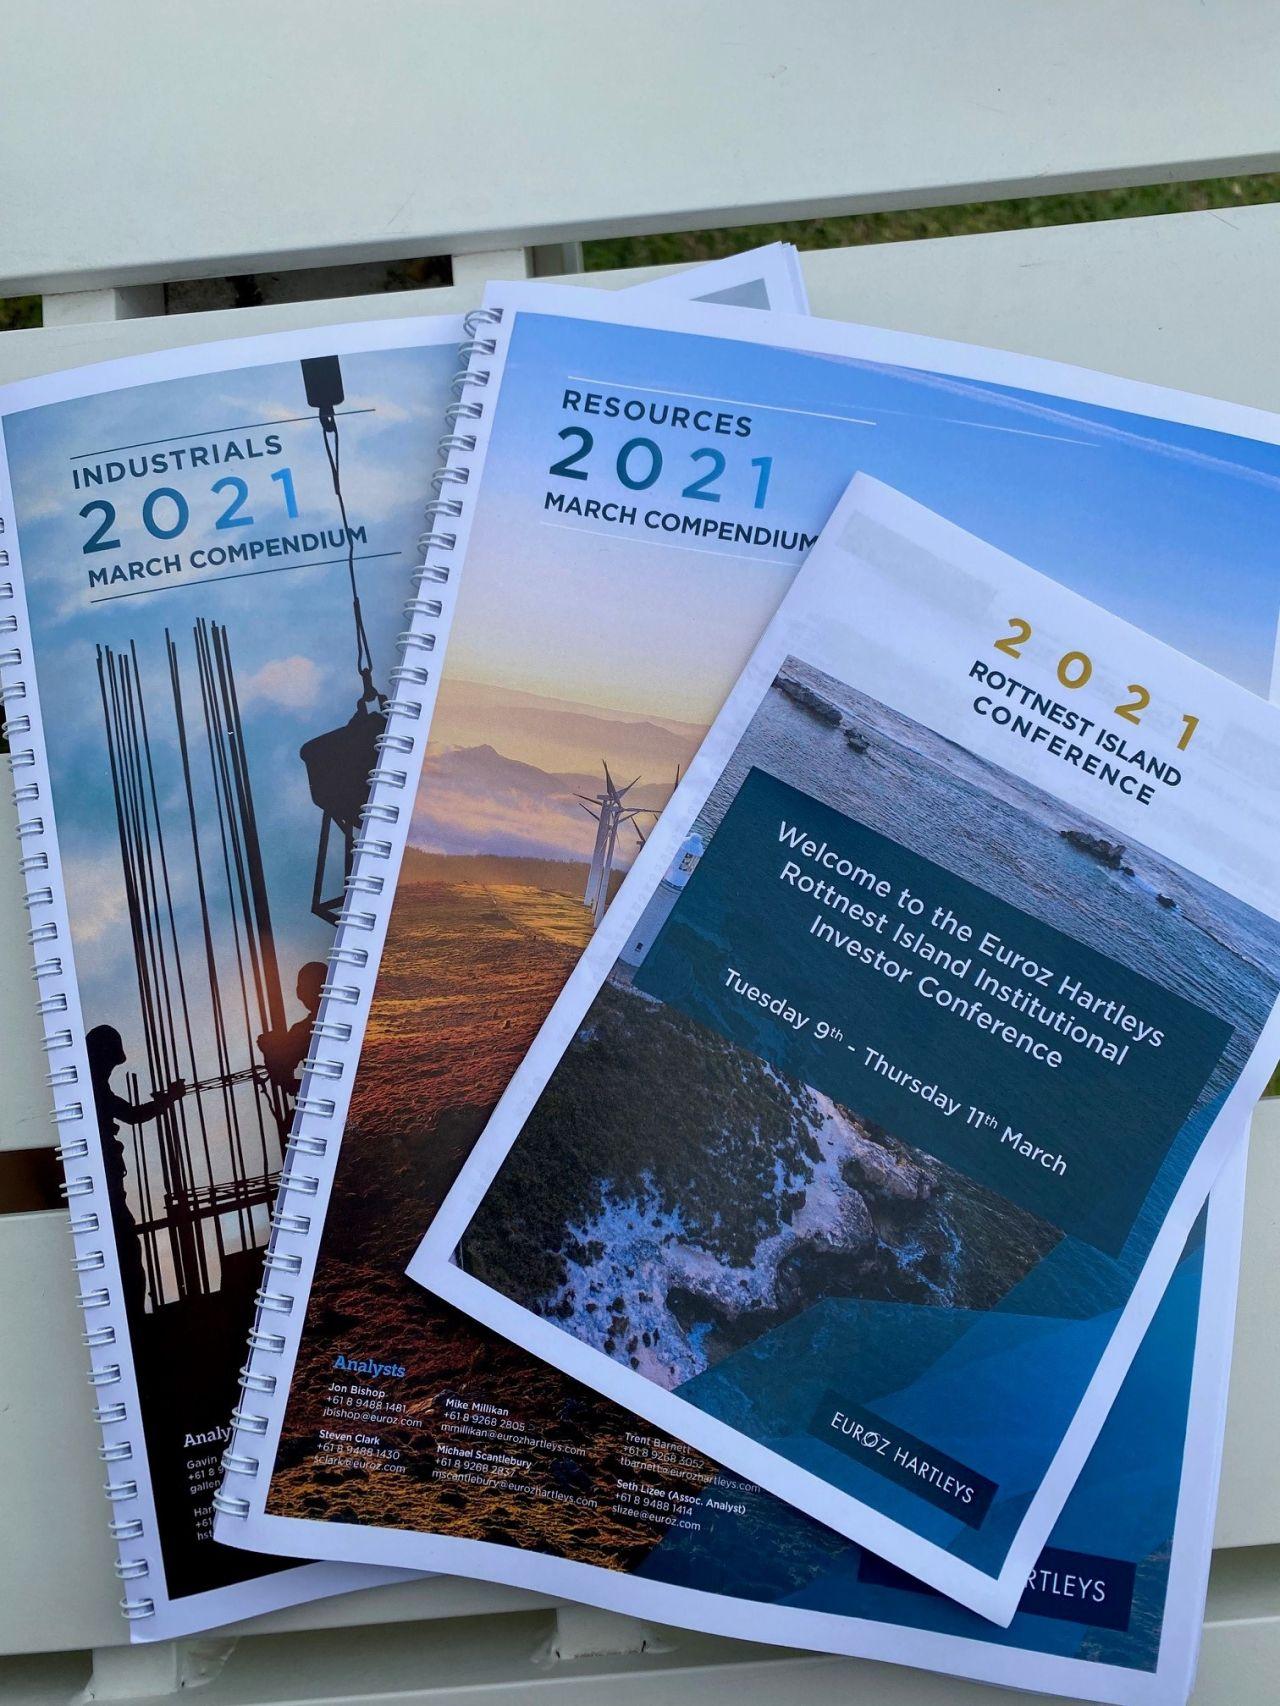 Rottnest Island Institutional Investor Conference 2021 7